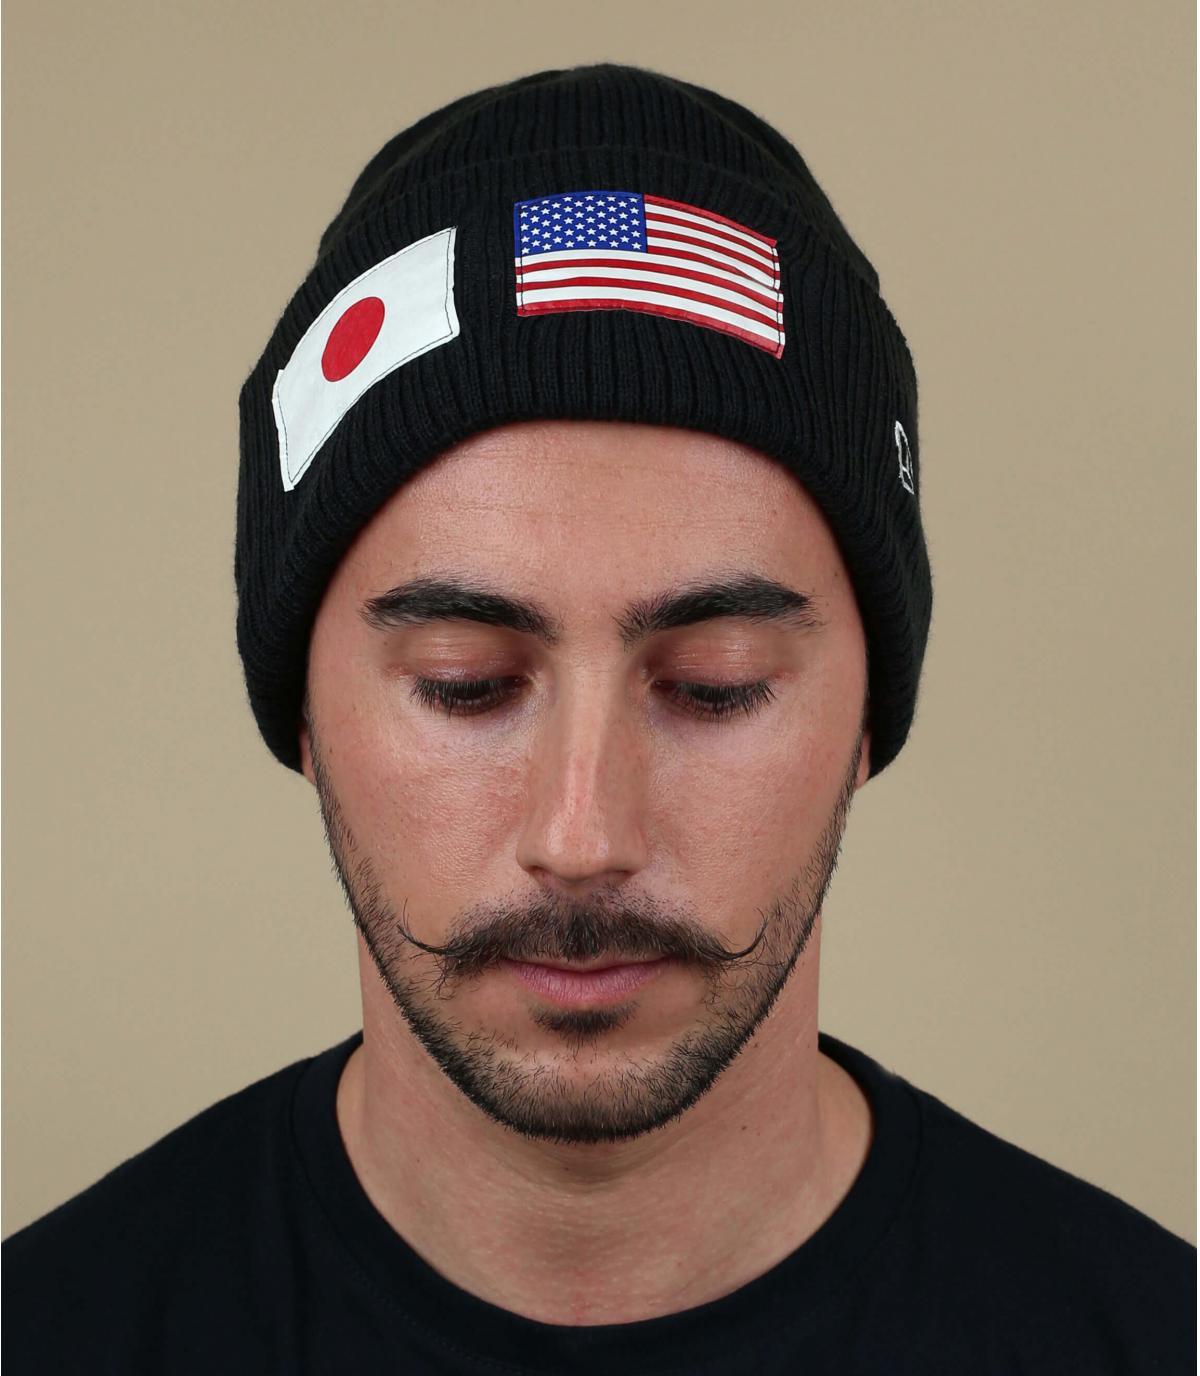 zwarte pet Amerikaanse vlag